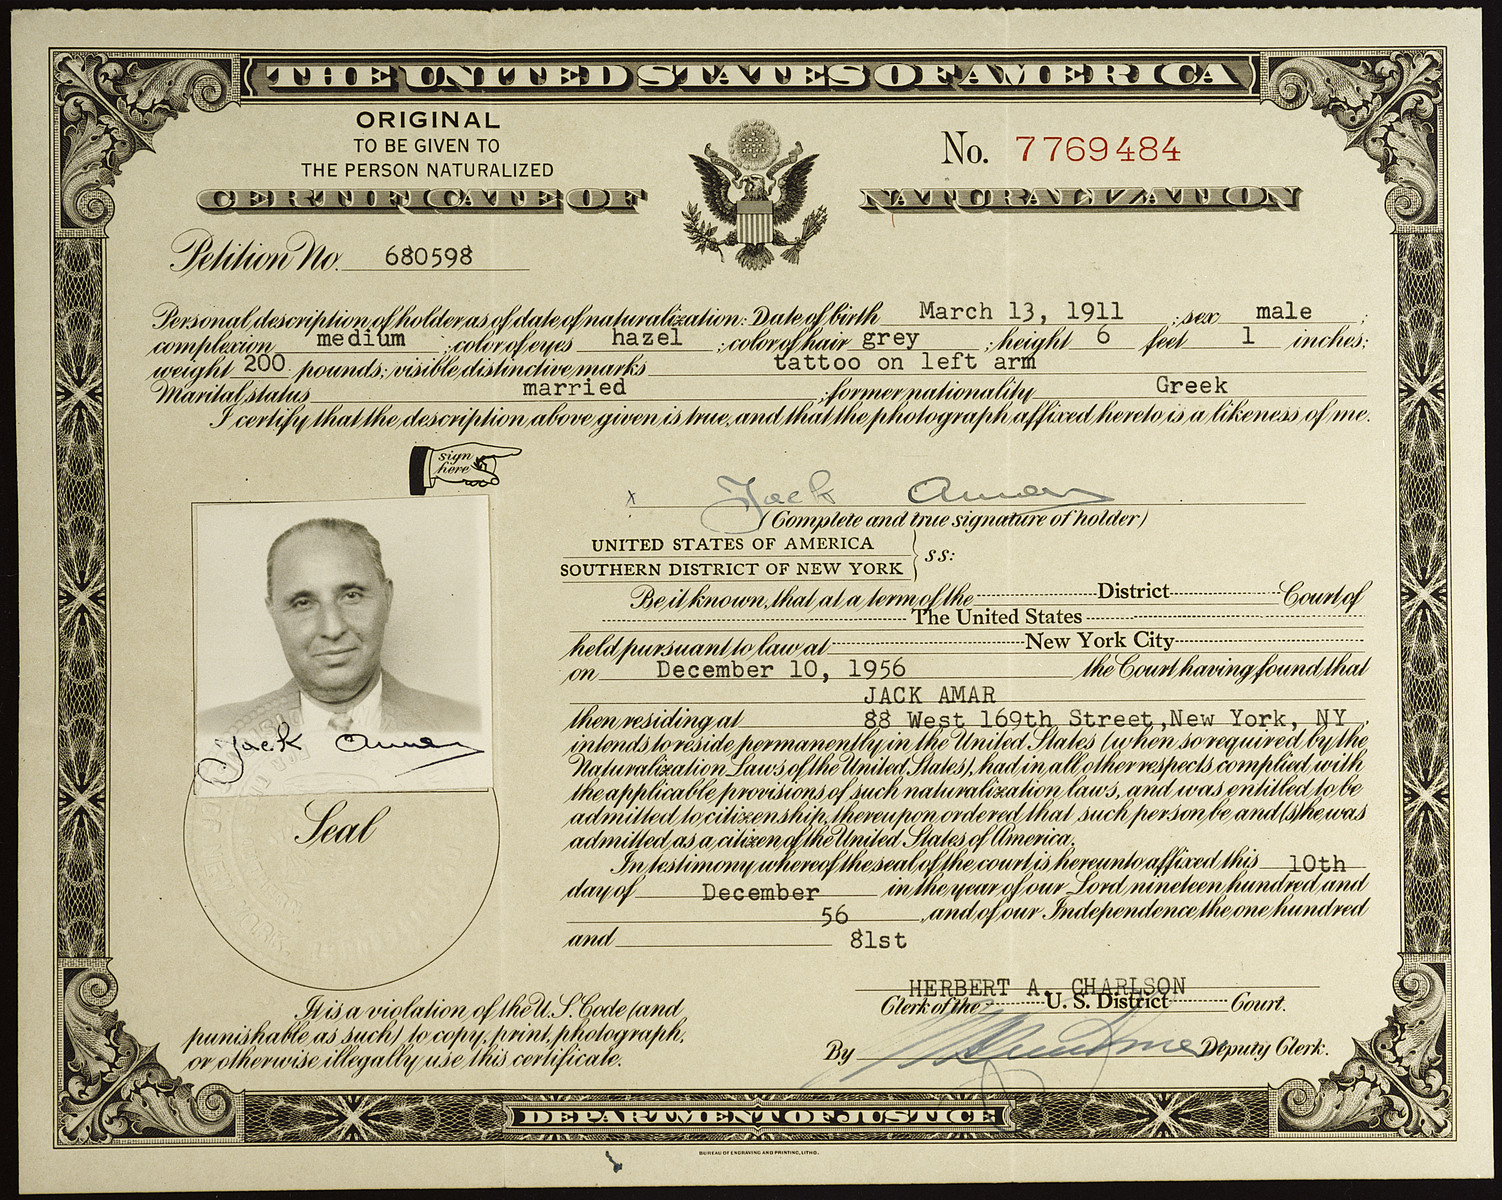 Naturalization Certificate Issued To Jack Amar A Greek Jewish